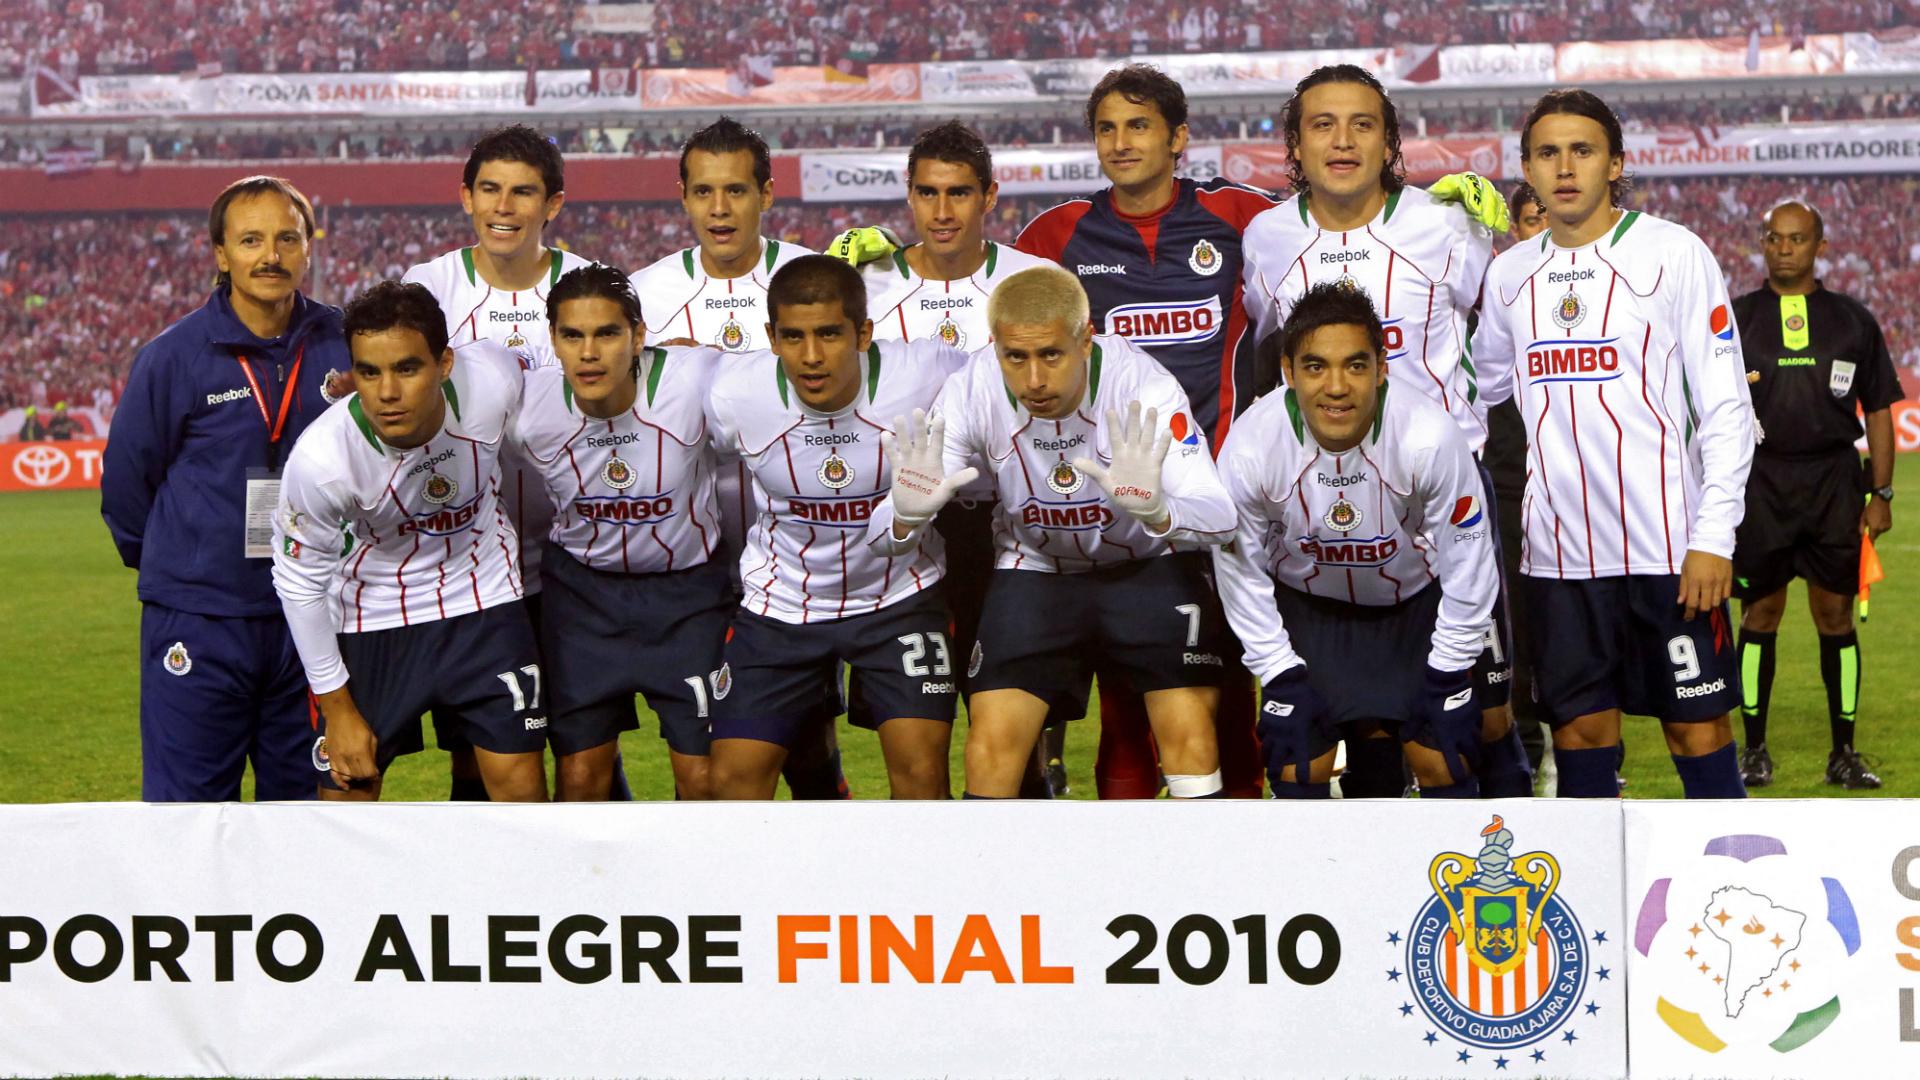 Chivas Libertadores 2010